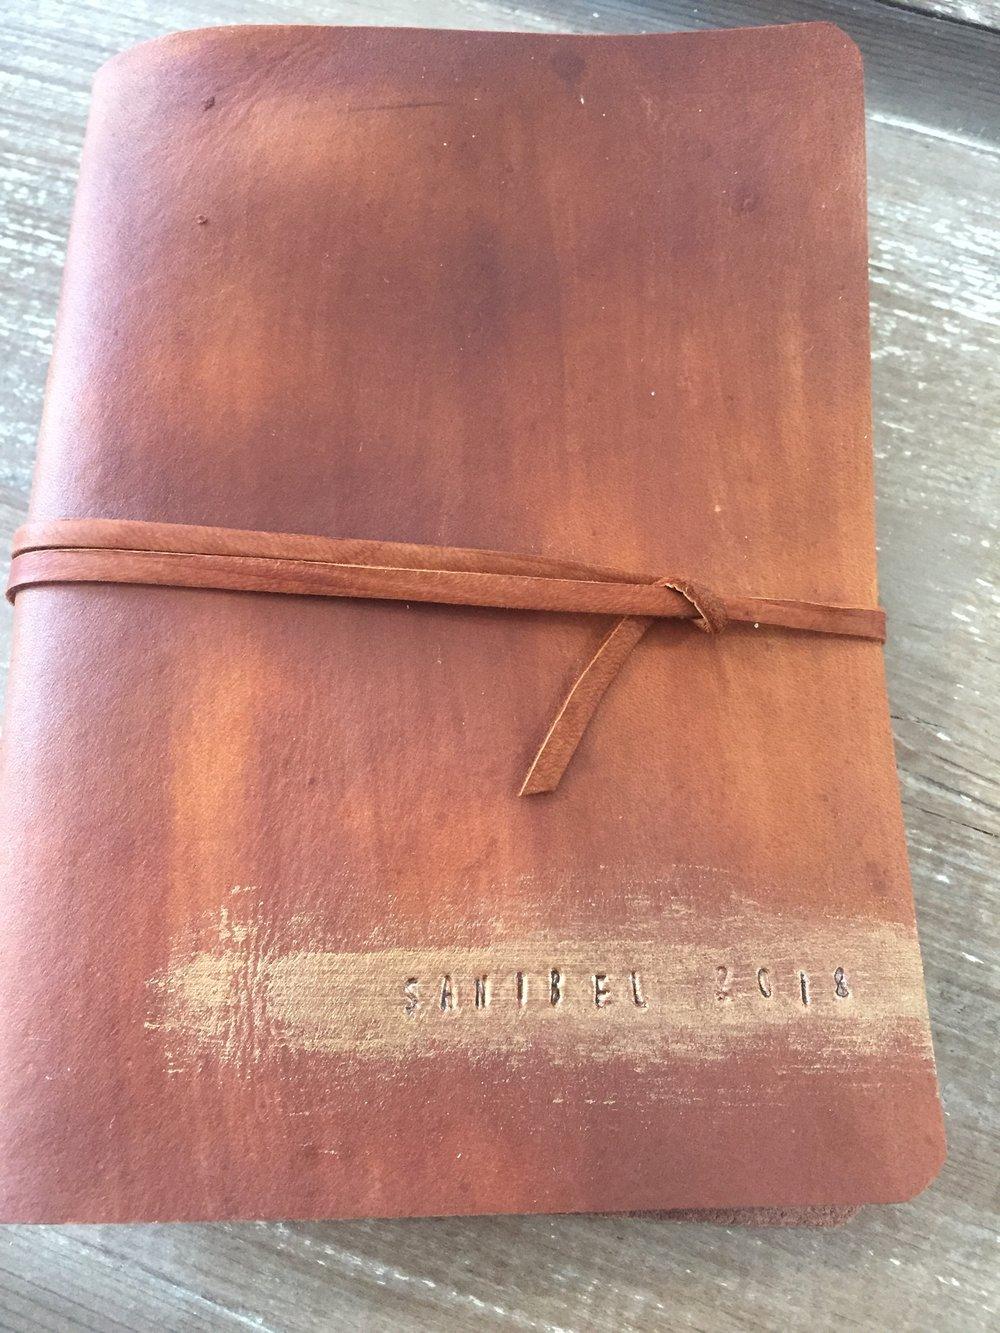 leather travelers notebook.JPG